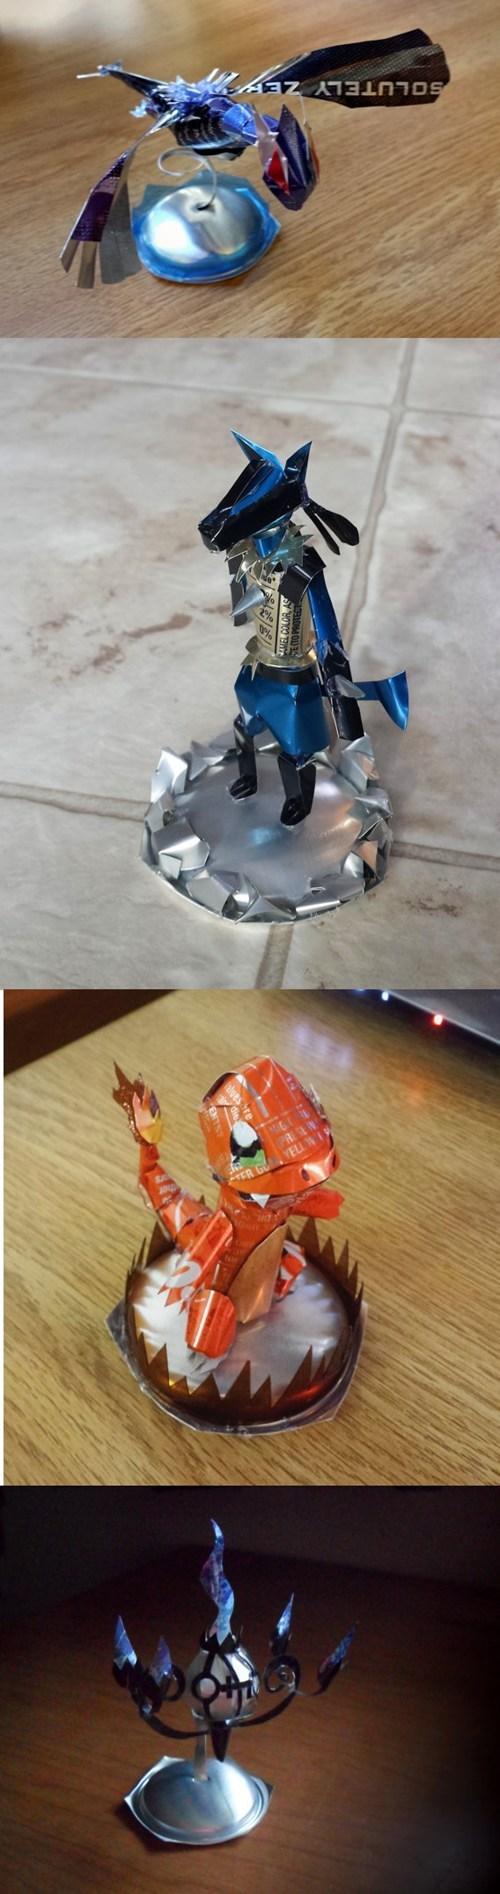 Pokémon,soda cans,sculptures